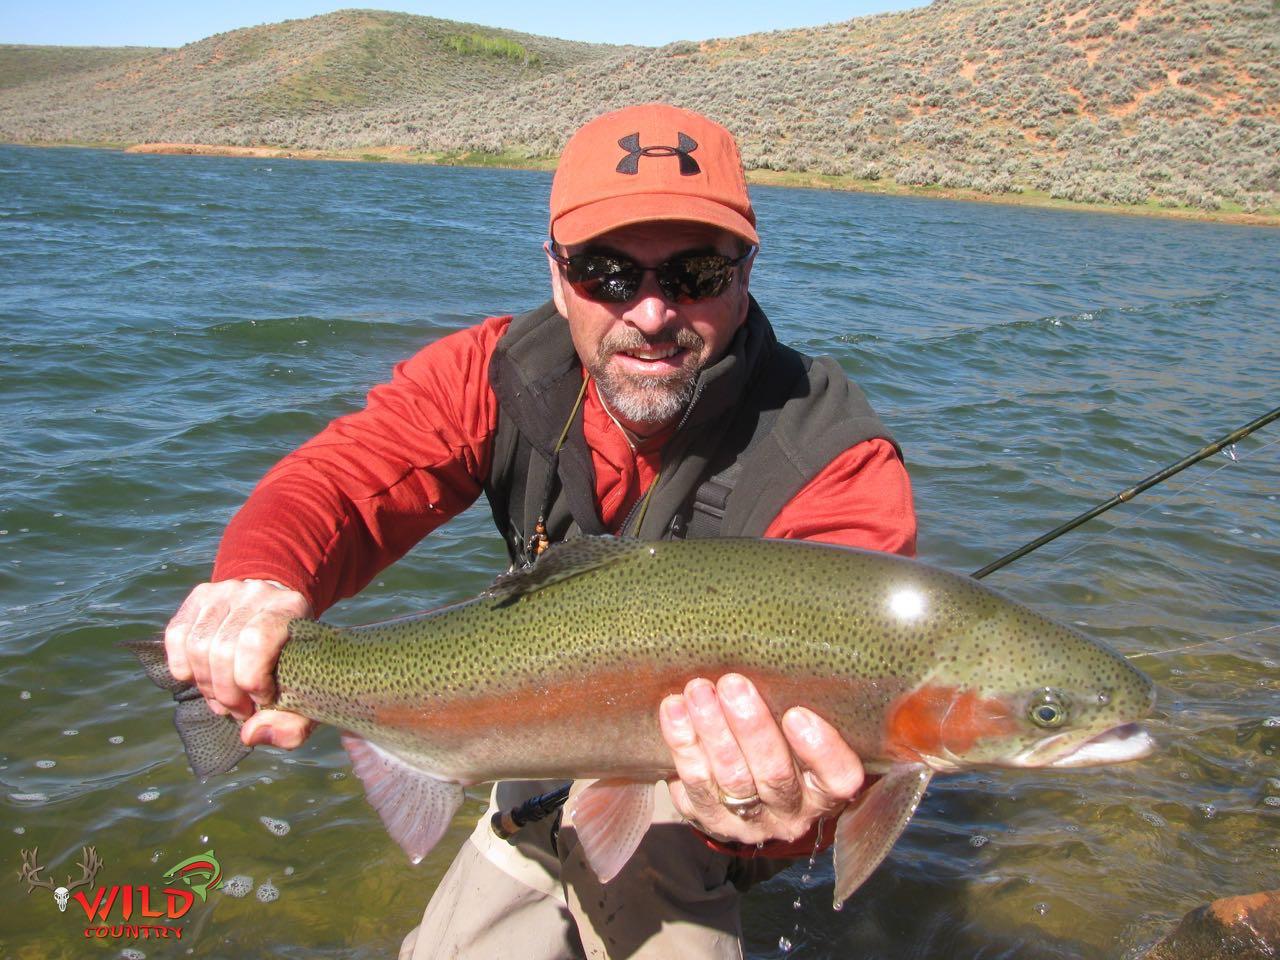 fly fishing utah rainbow trout - 9.jpg